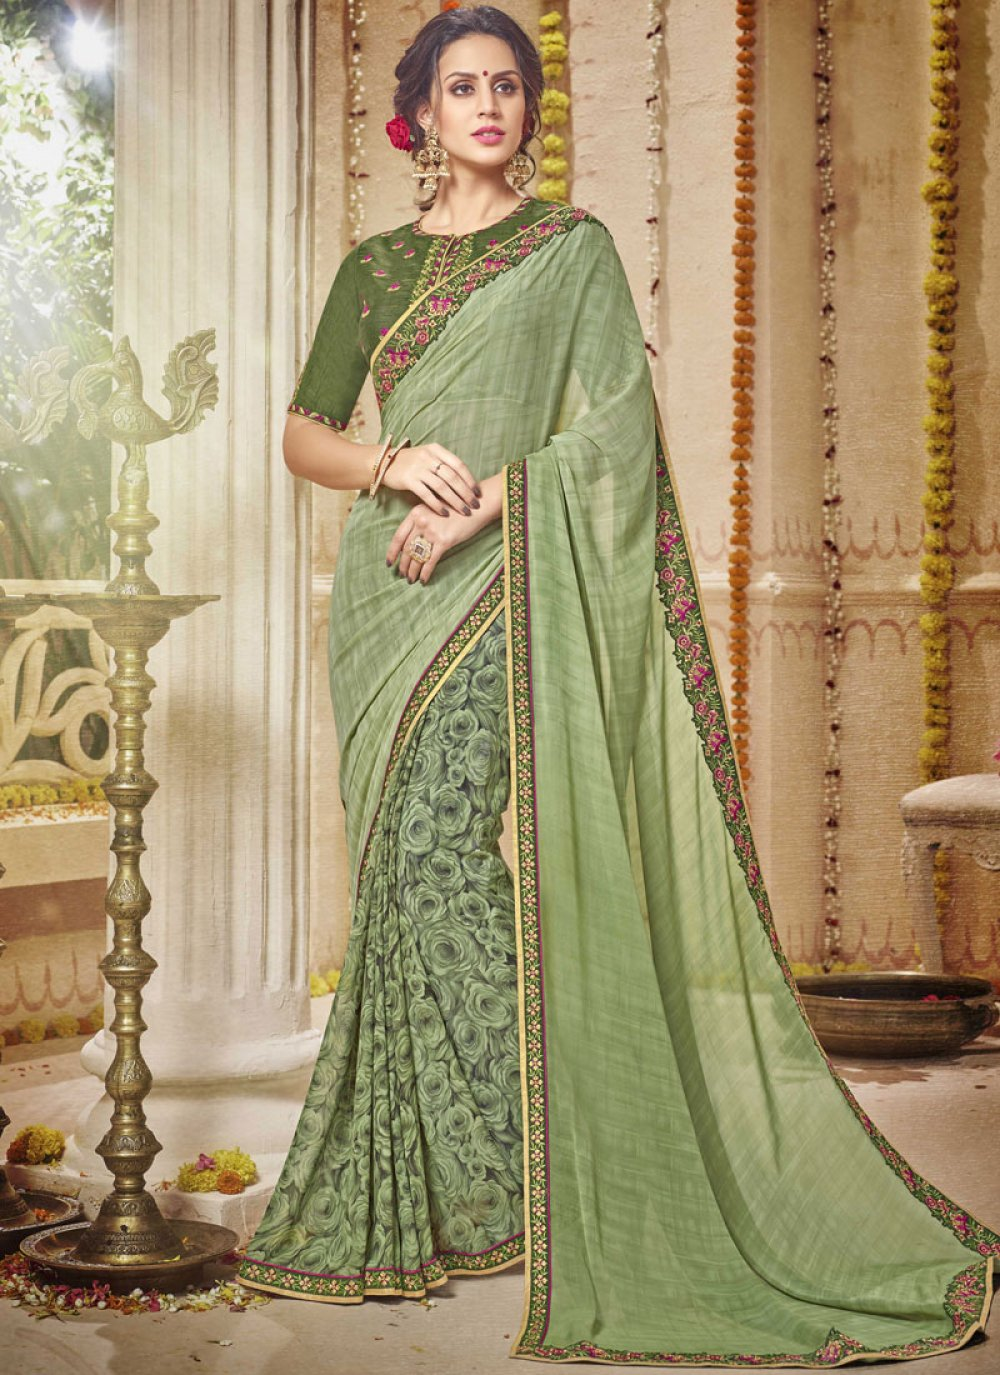 Georgette Green Trendy Saree